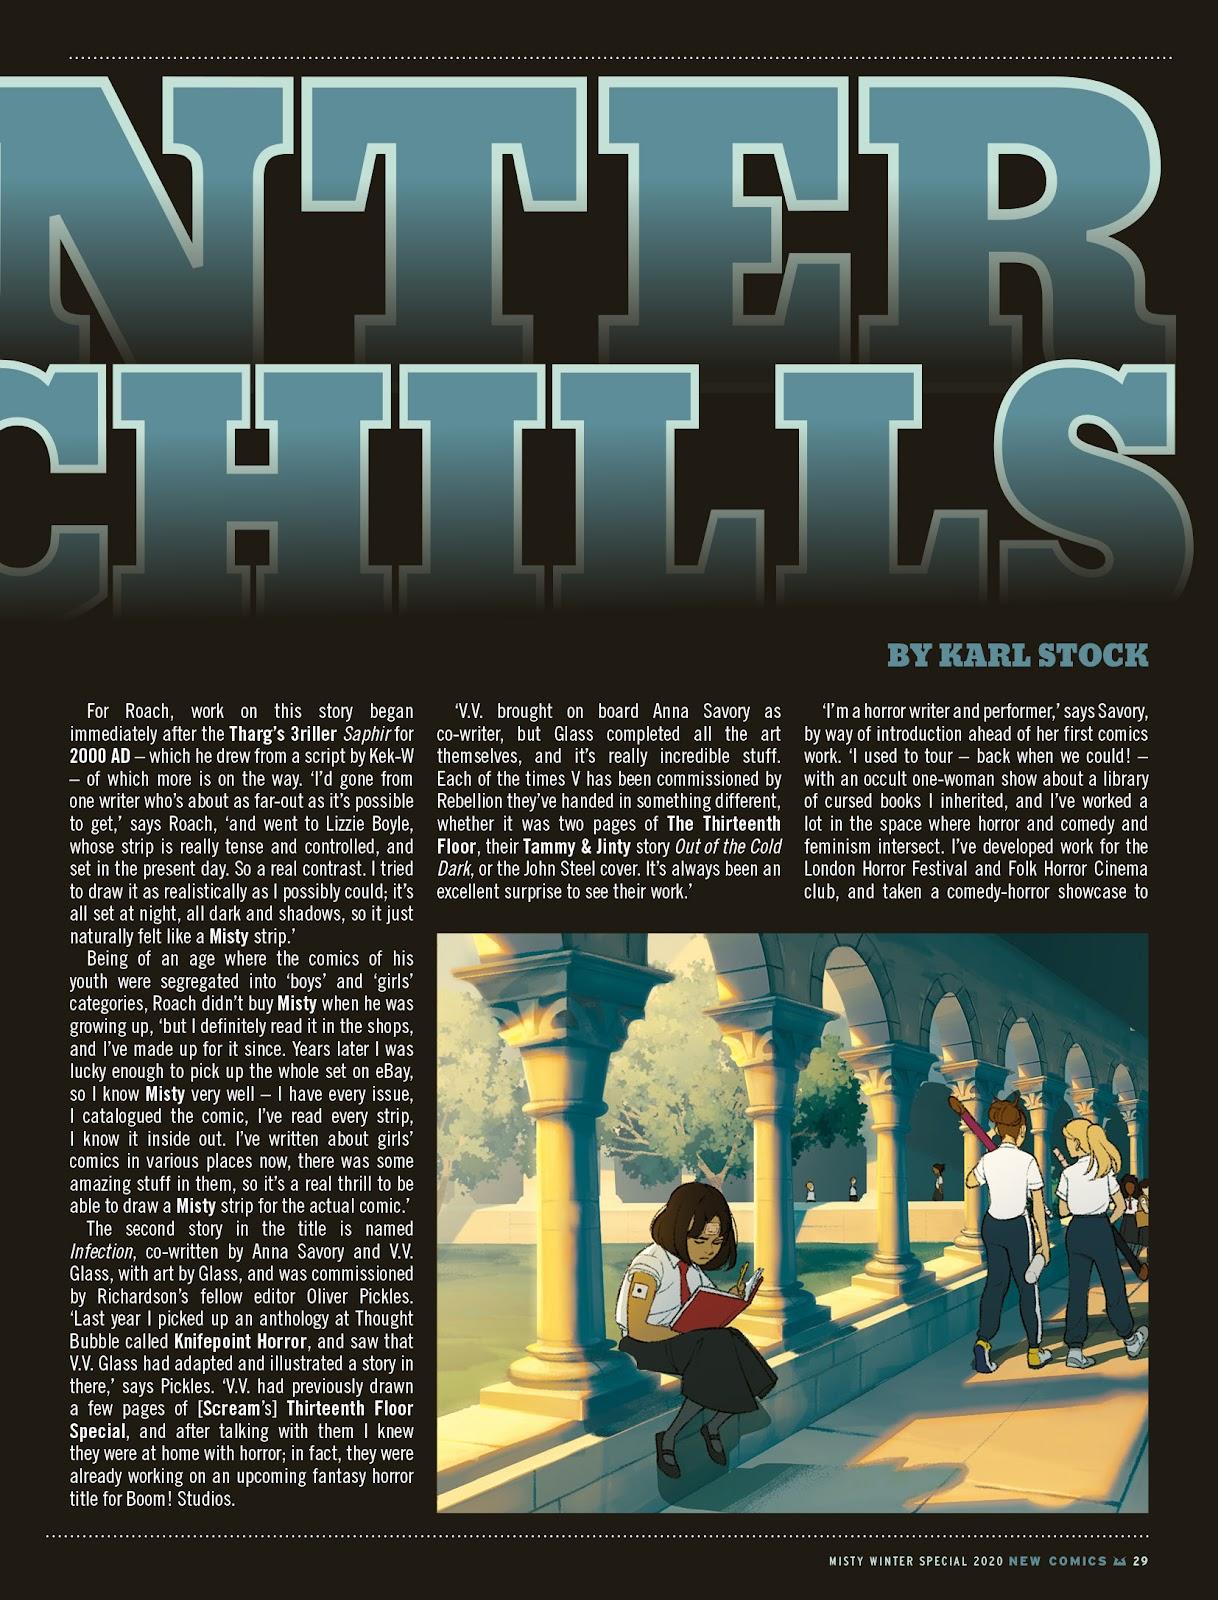 Judge Dredd Megazine (Vol. 5) issue 427 - Page 28